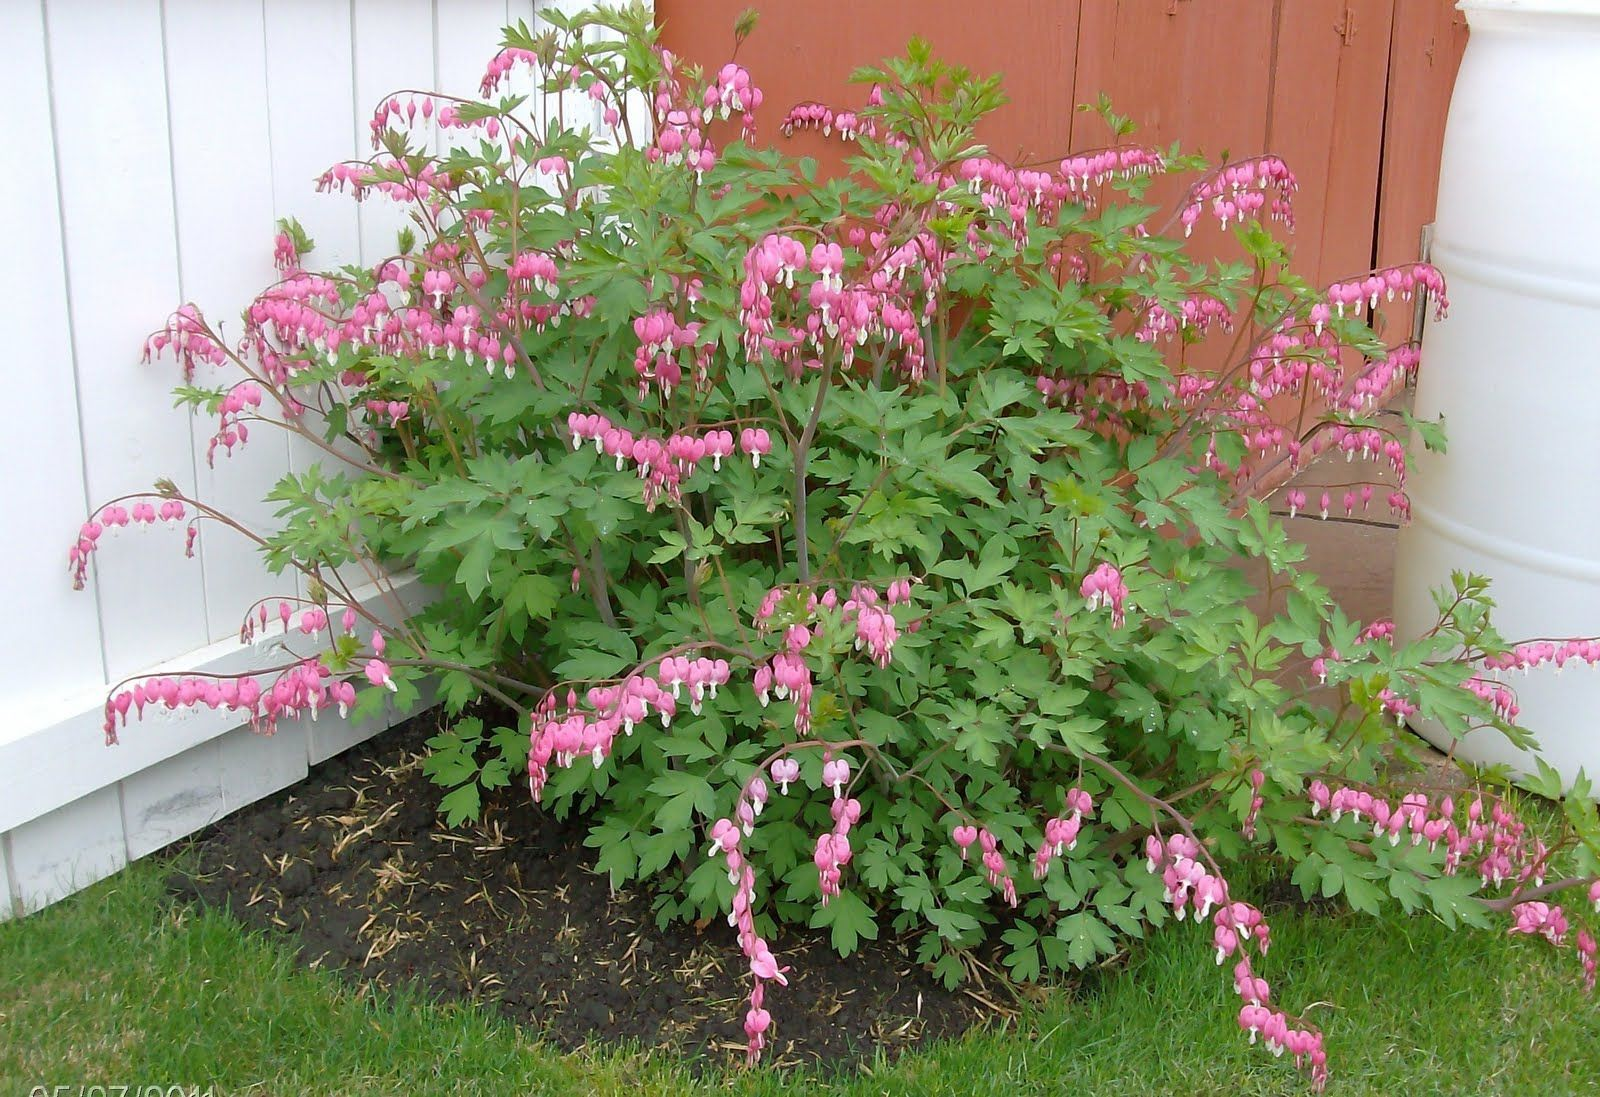 Backyard Garden With Bleeding Heart Plants Bleeding